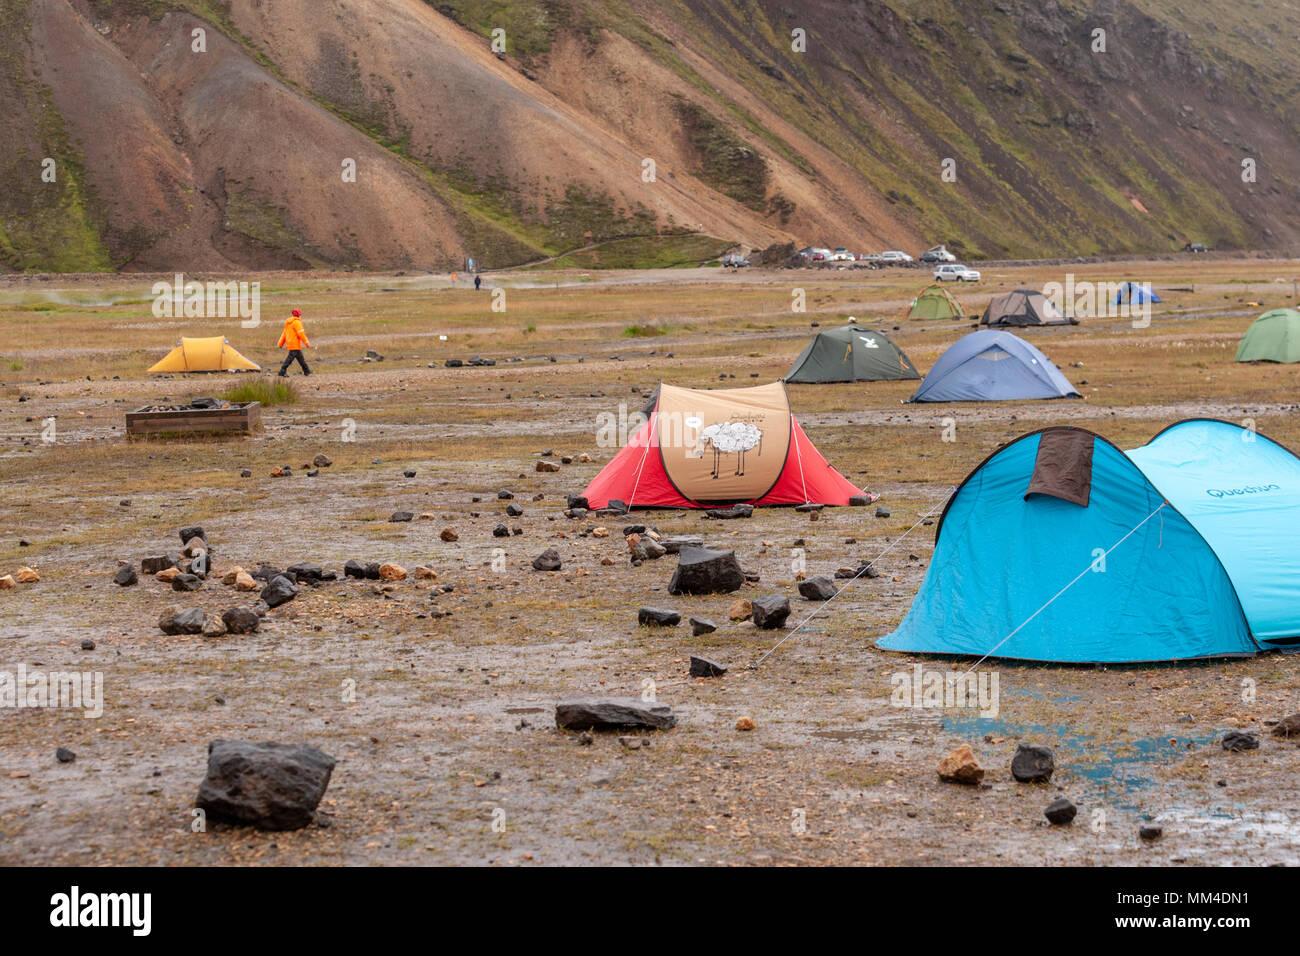 The campsite in the Landmannalaugar valley, Landmannalaugar,  Fjallabak Nature Reserve, Iceland - Stock Image